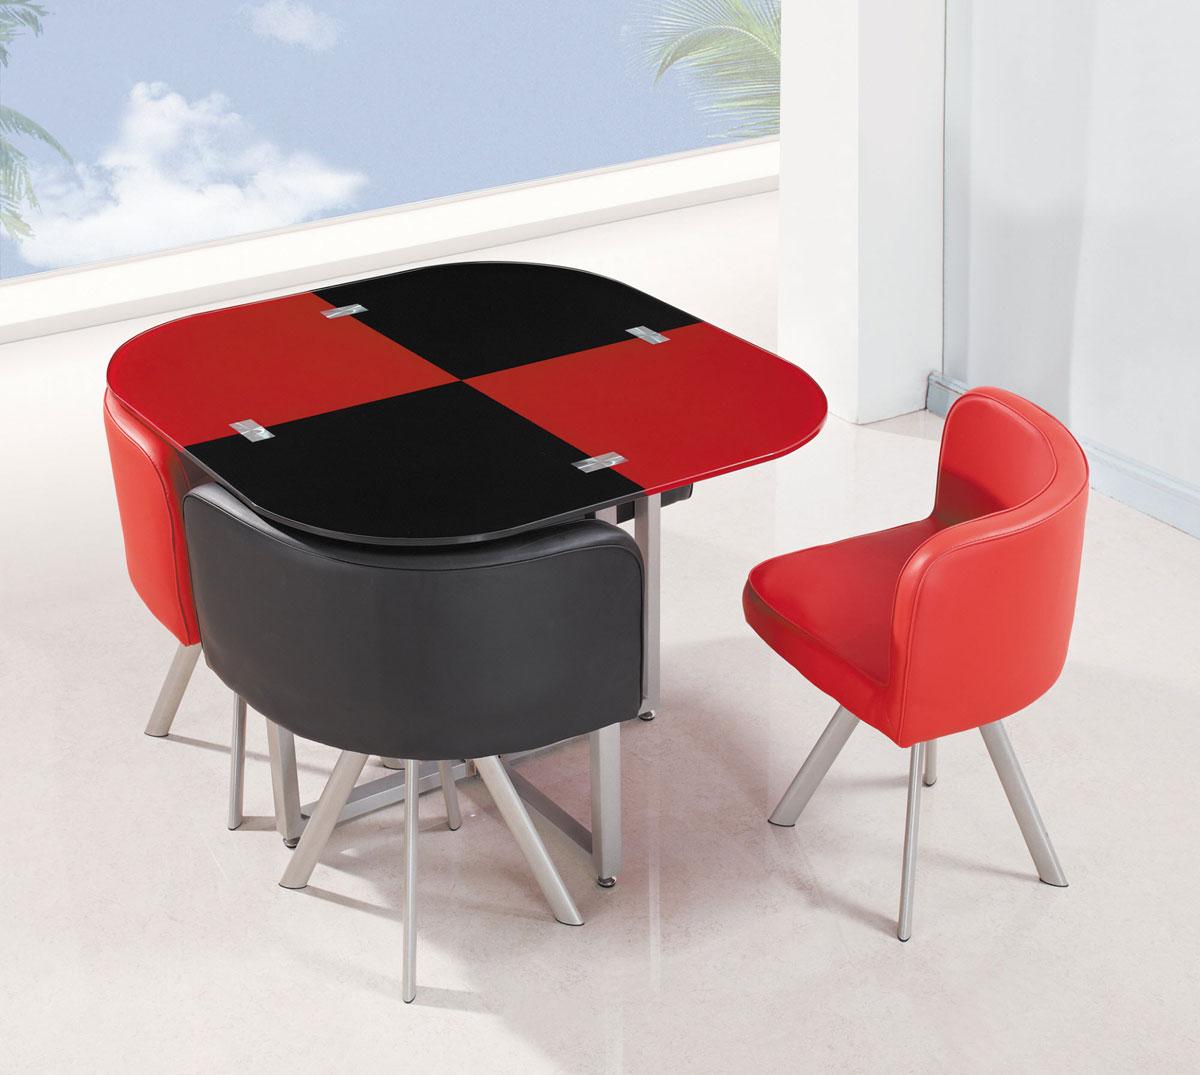 Global Furniture USA 536-1DT Dining Set - Vinyl/Black/Red - Metal Legs